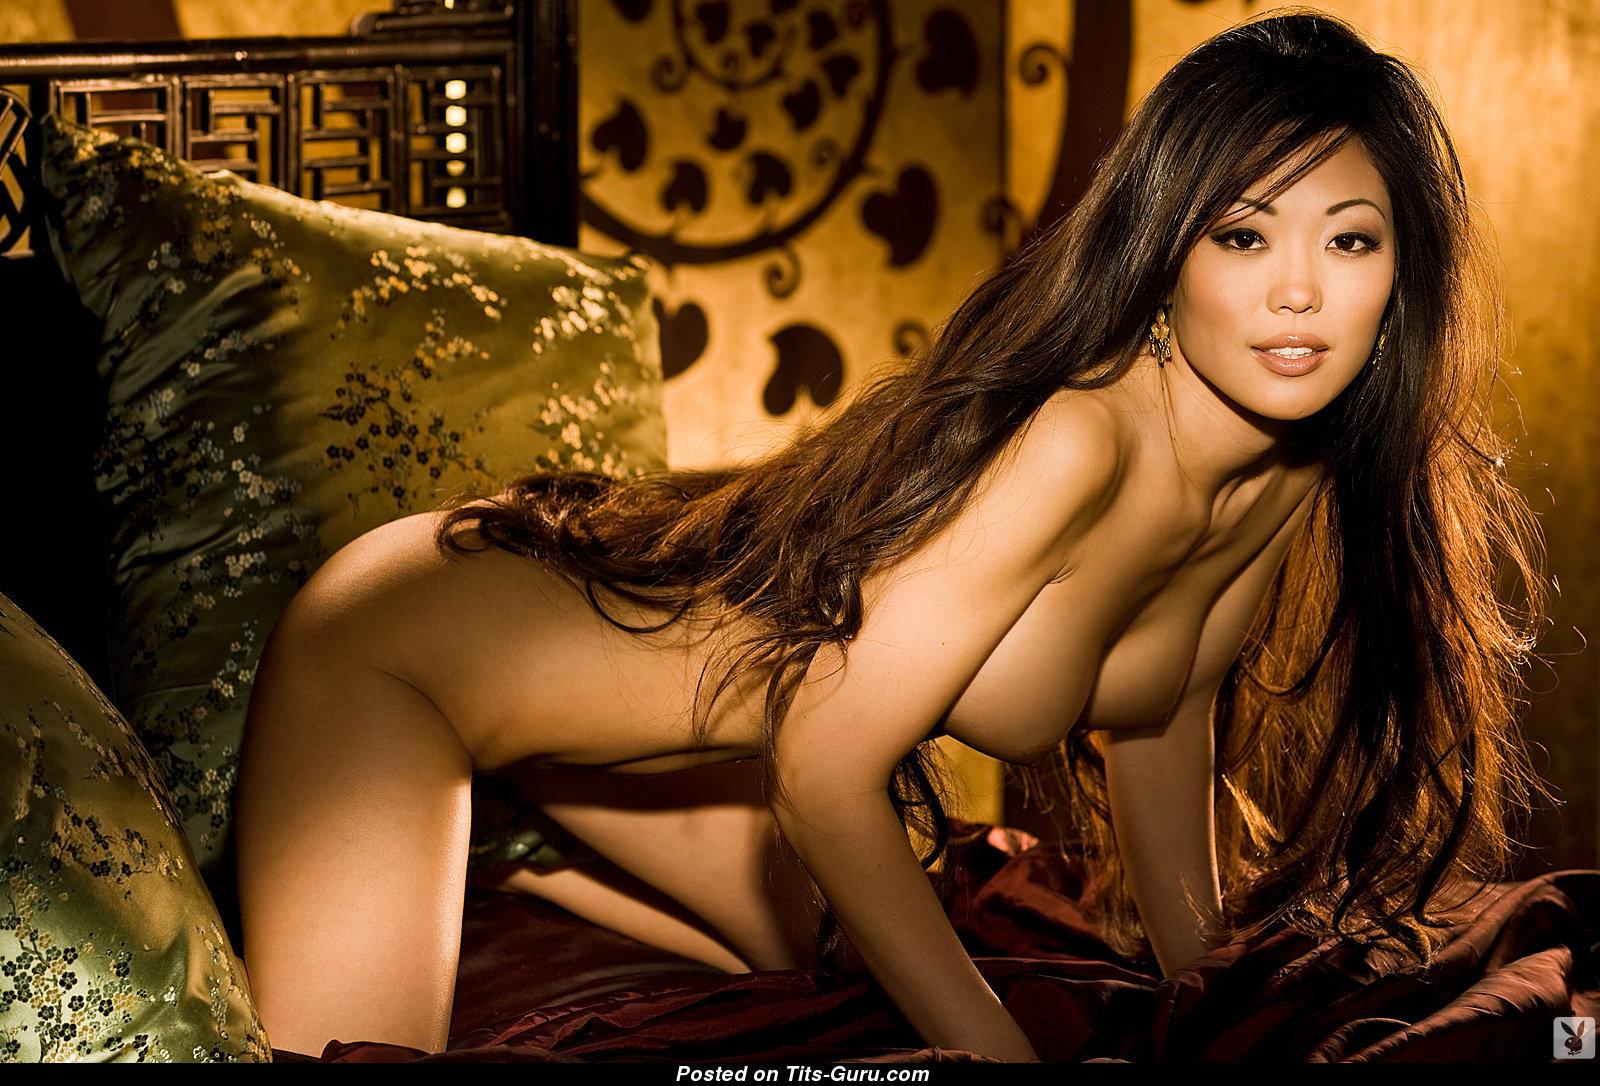 Japan sex scandal nude